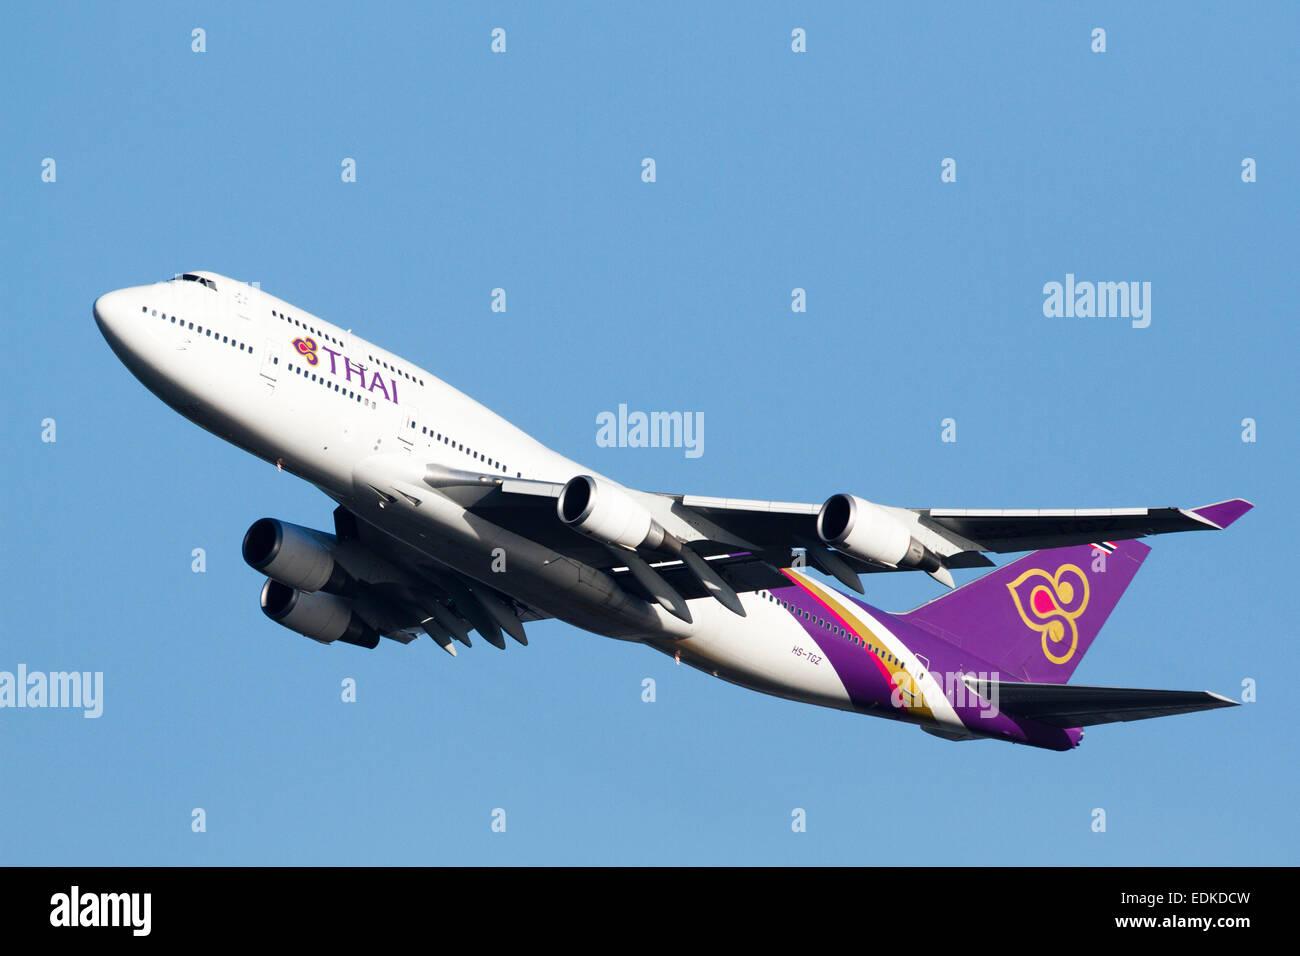 Thai Uk Stock Photos & Thai Uk Stock Images - Alamy